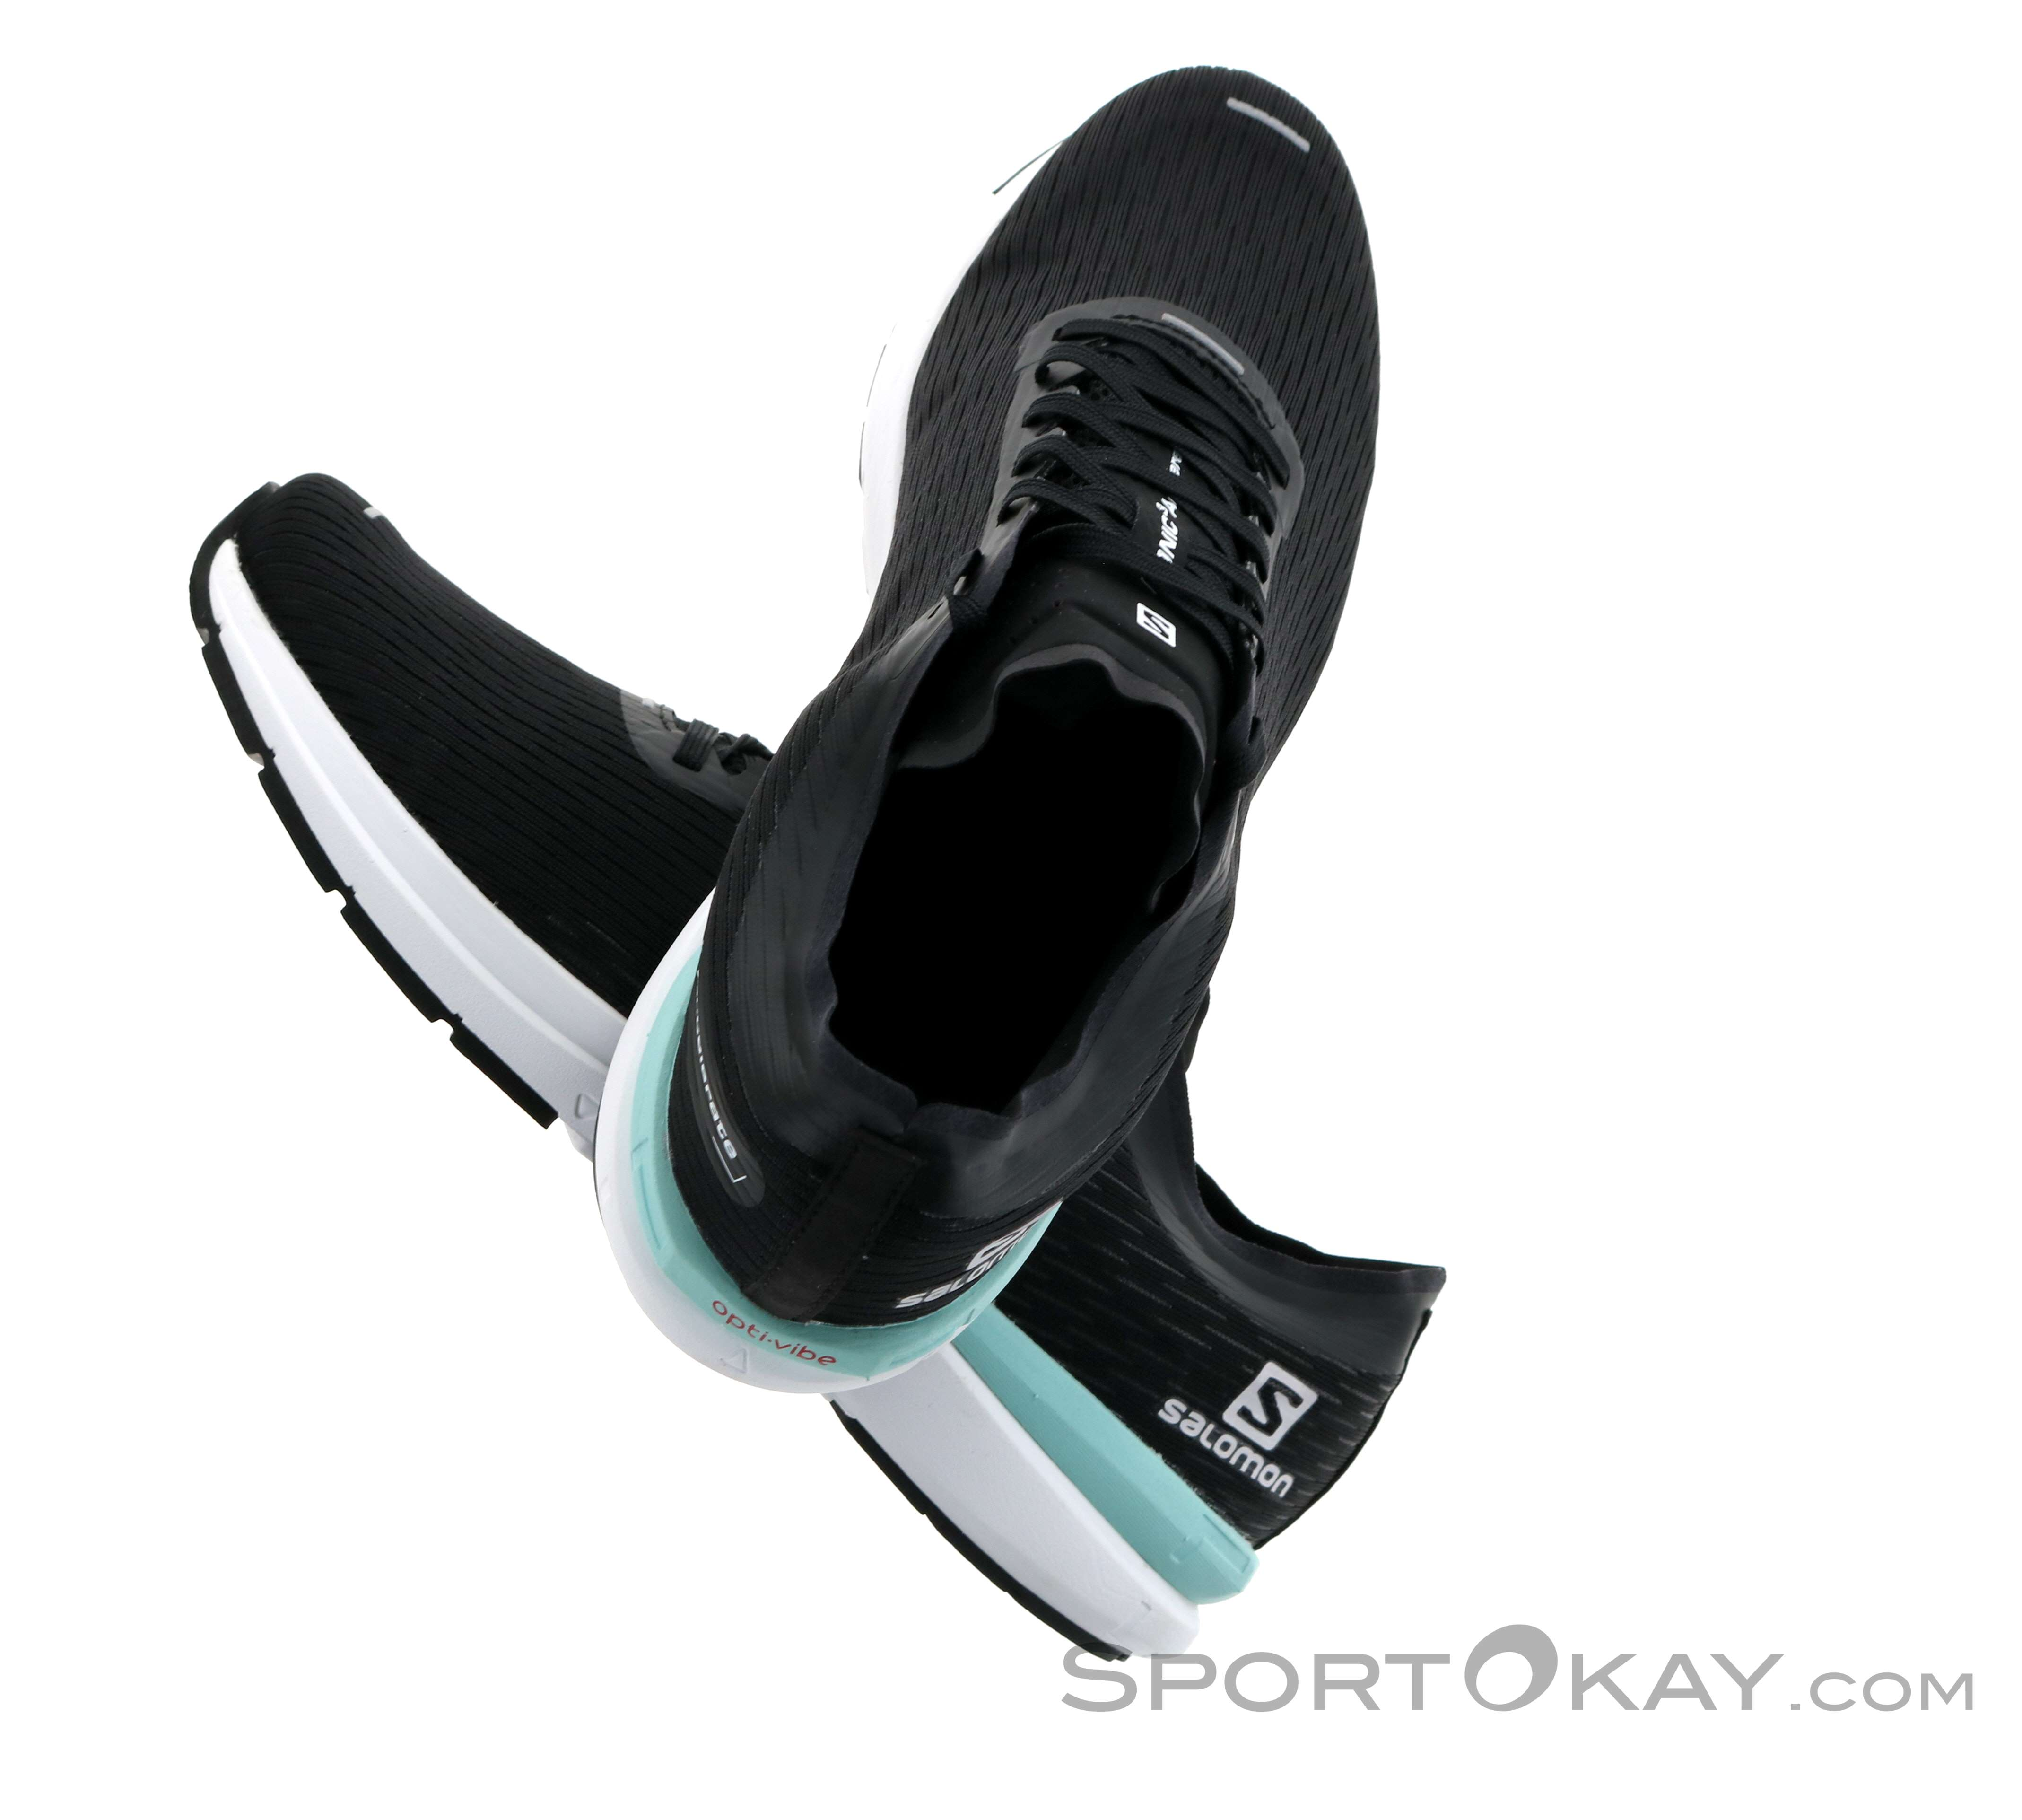 Salomon Salomon Sonic 3 Accelerate Mens Running Shoes